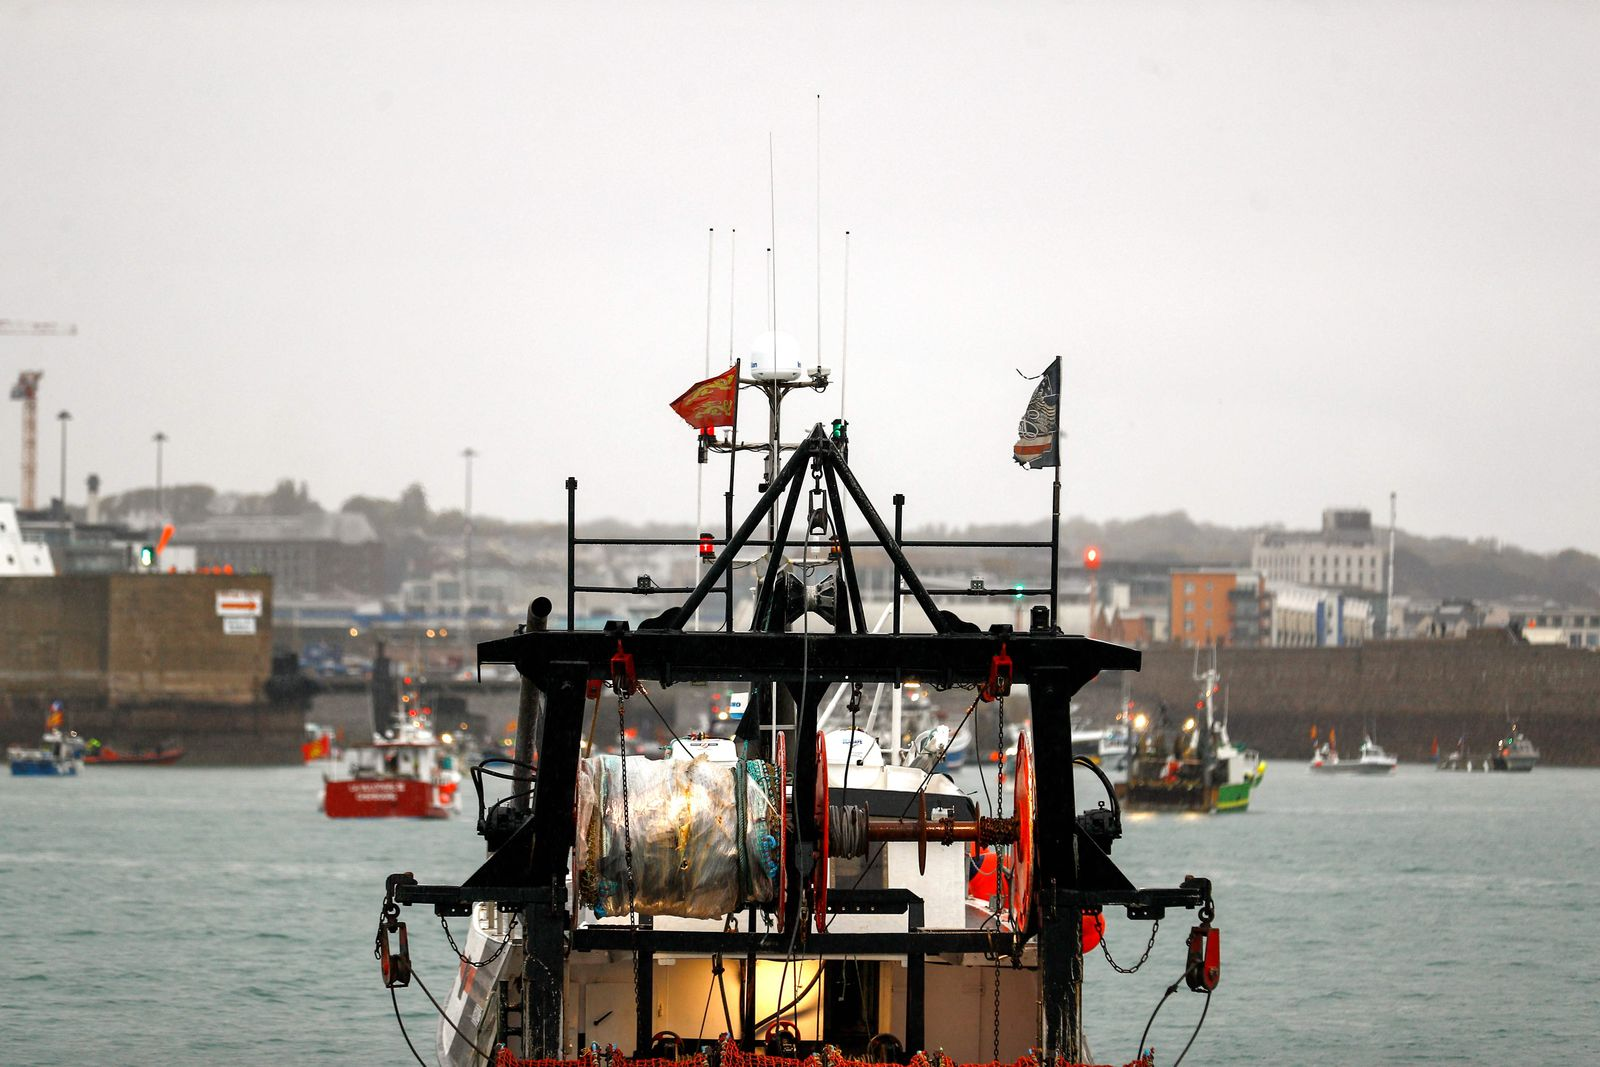 FRANCE-BRITAIN-EU-BREXIT-PROTEST-FISHING